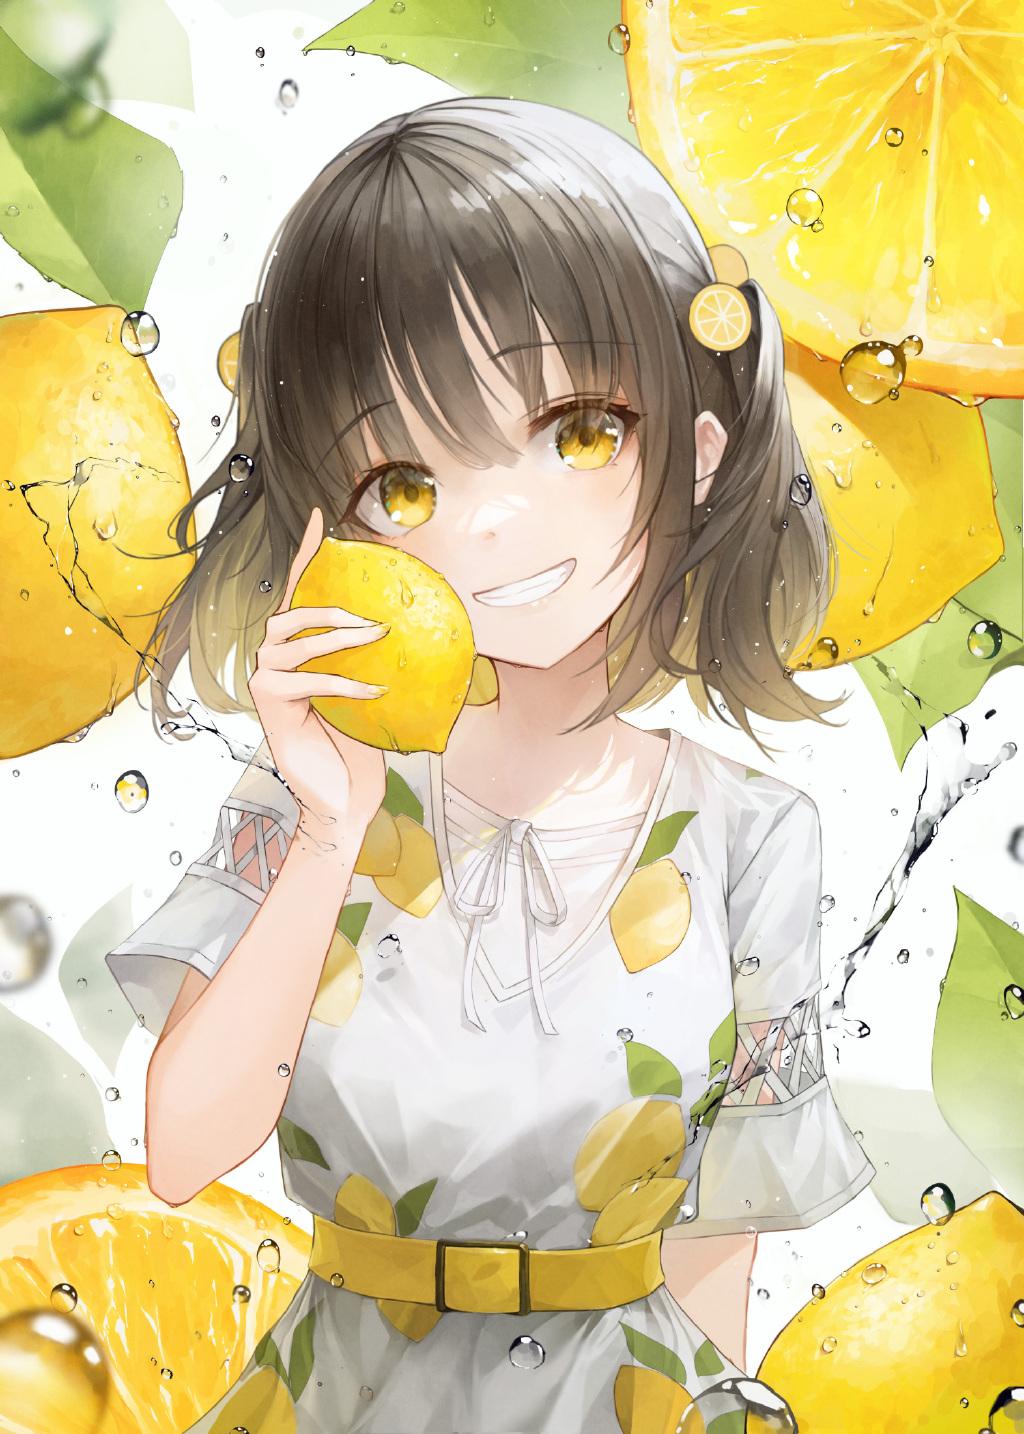 【P站画师】香甜水果少女!韩国画师CrystalHerb的最新插画作品- DIMTOWN.COM